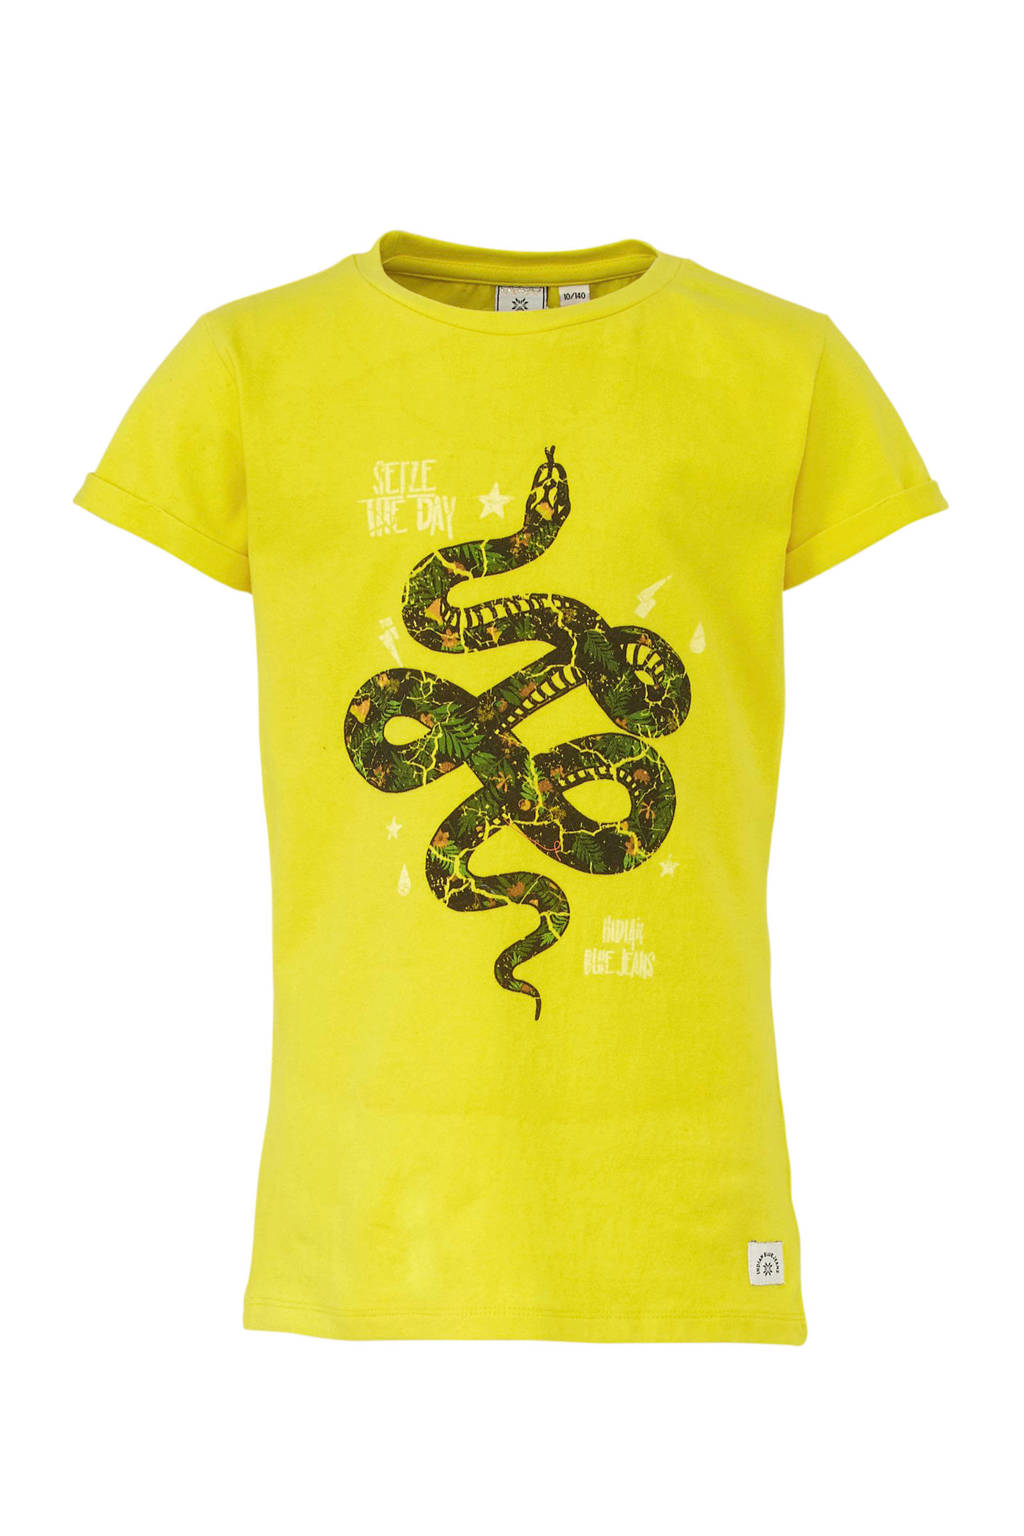 Indian Blue Jeans T-shirt met printopdruk geel/zwart, Geel/zwart